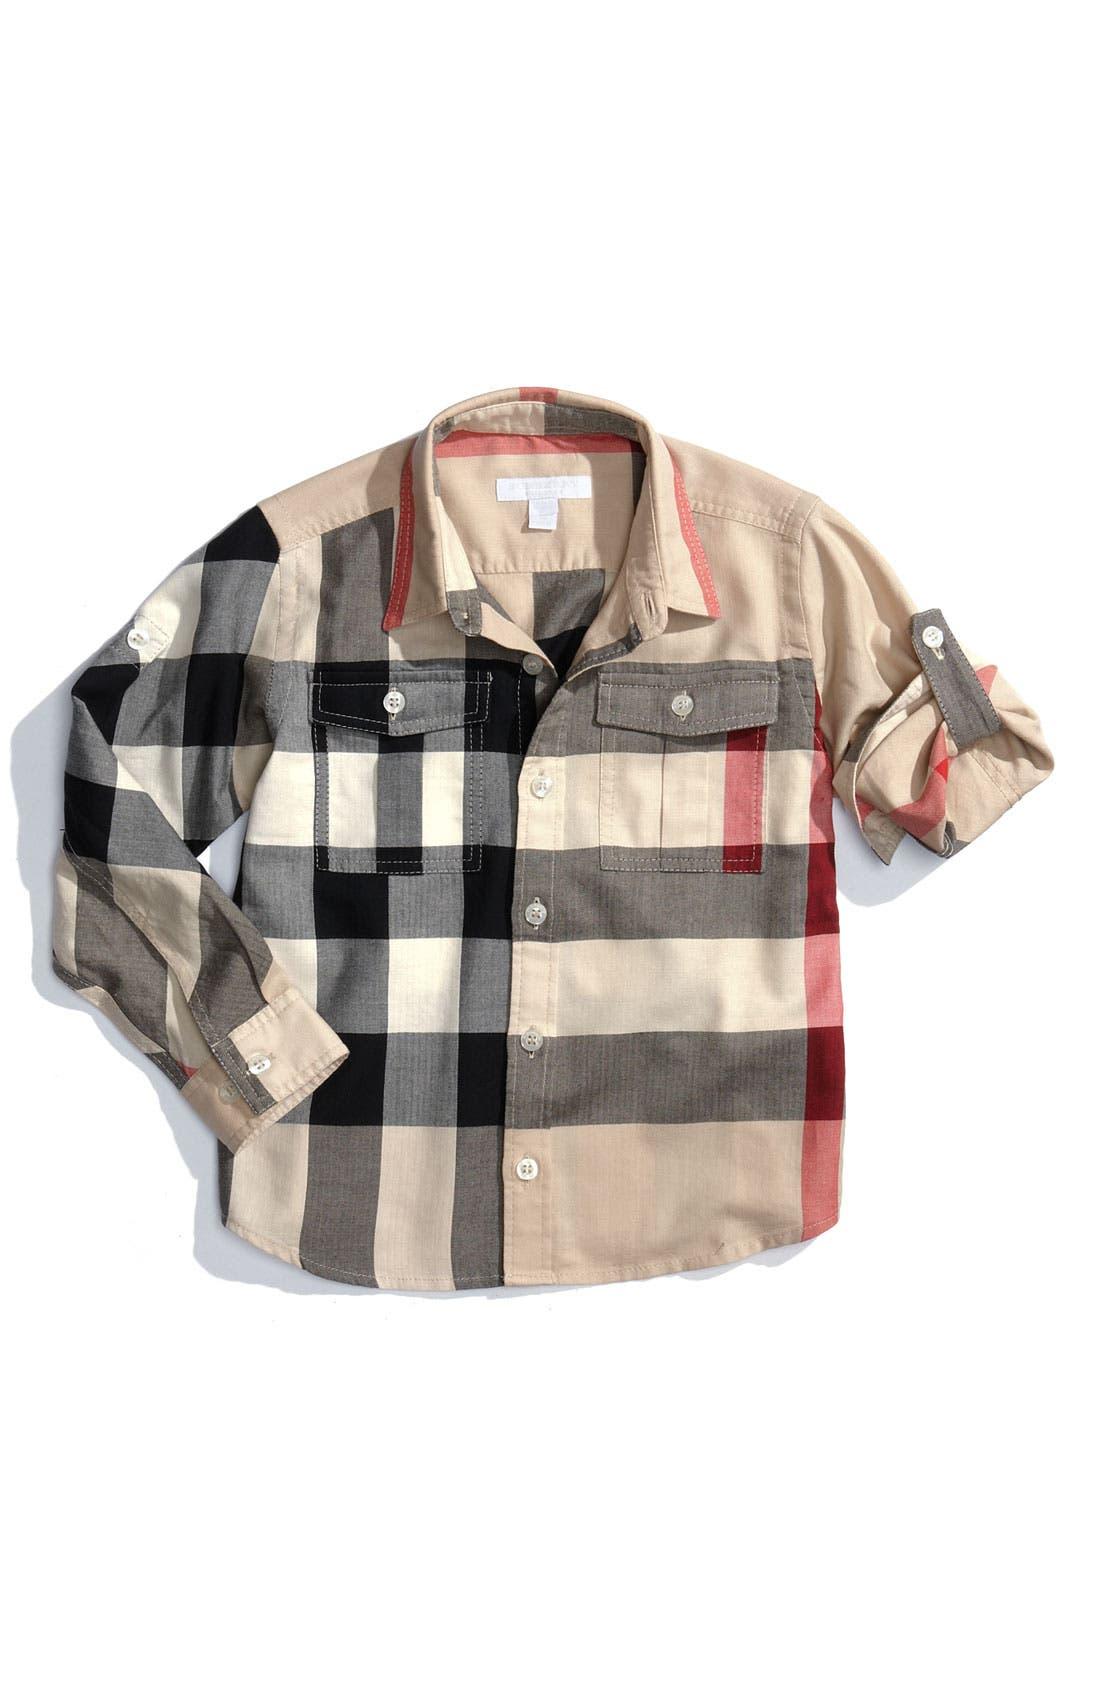 Main Image - Burberry Check Print Woven Shirt (Little Boys)